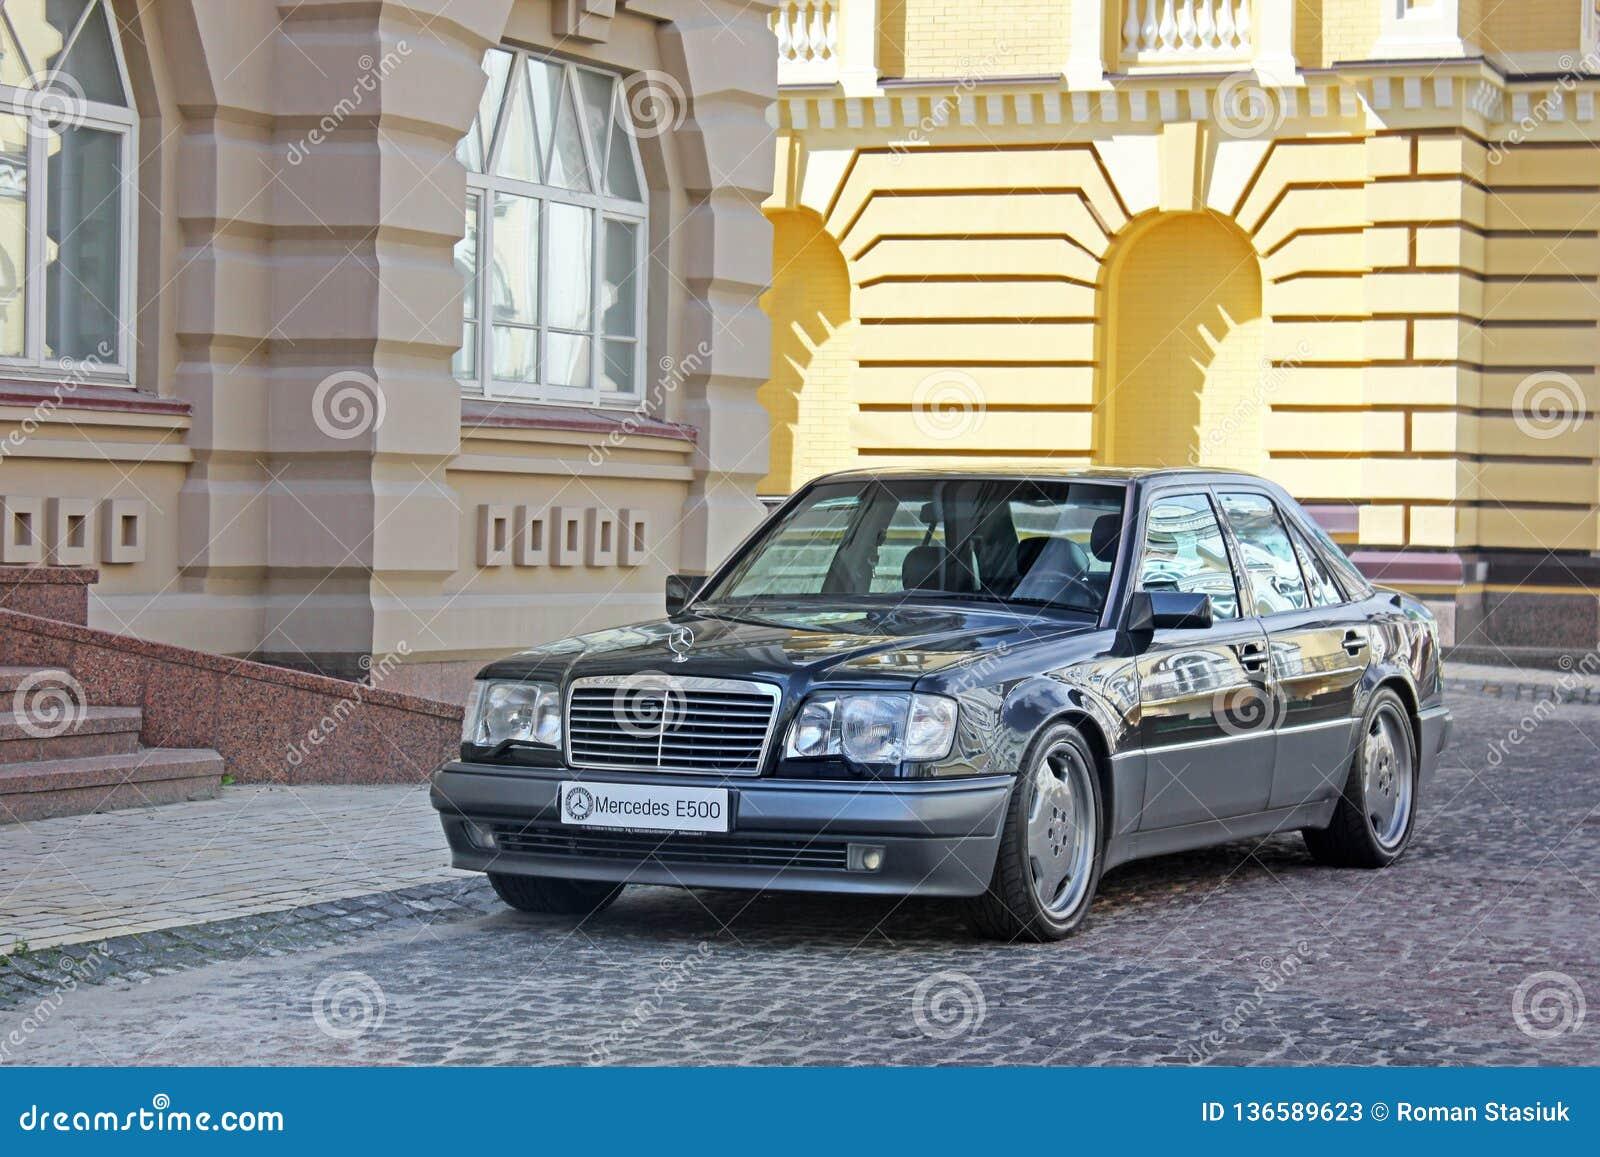 June 12, 2011, Kiev - Ukraine  Mercedes E500 W124 Wolf On The